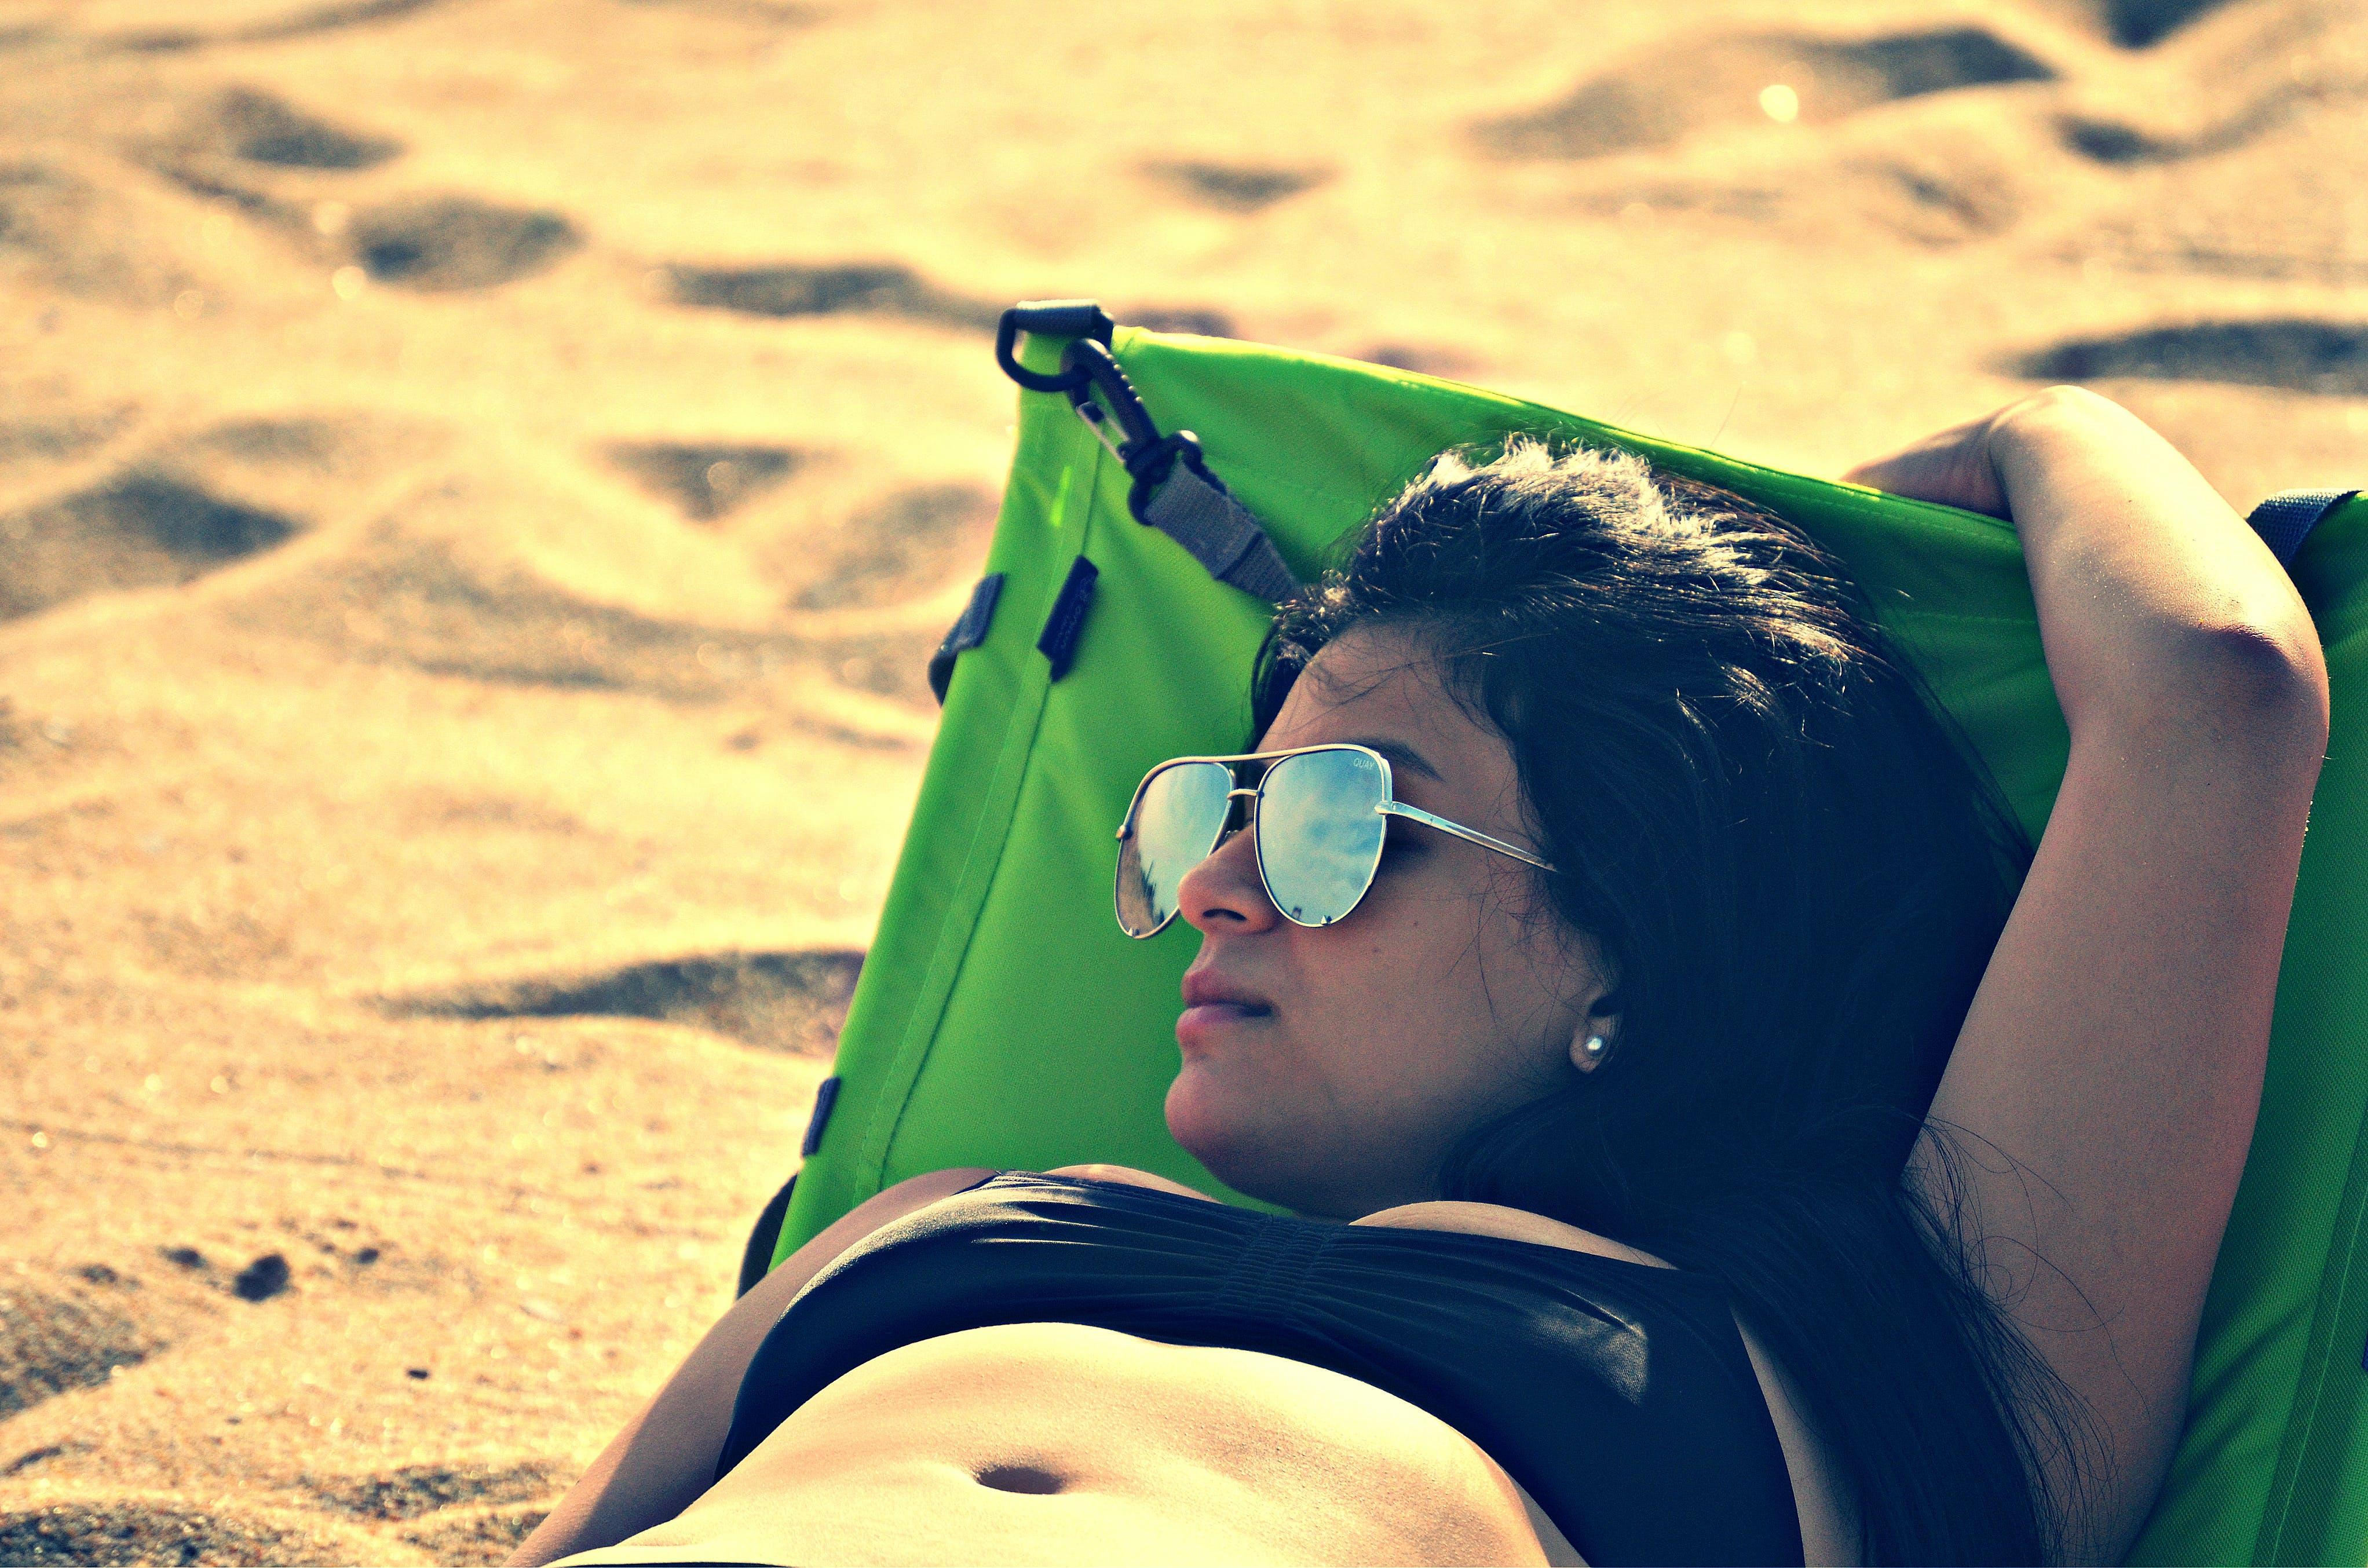 Woman Wearing Bikini Top Lying on Bed Beside Sand at Daytime